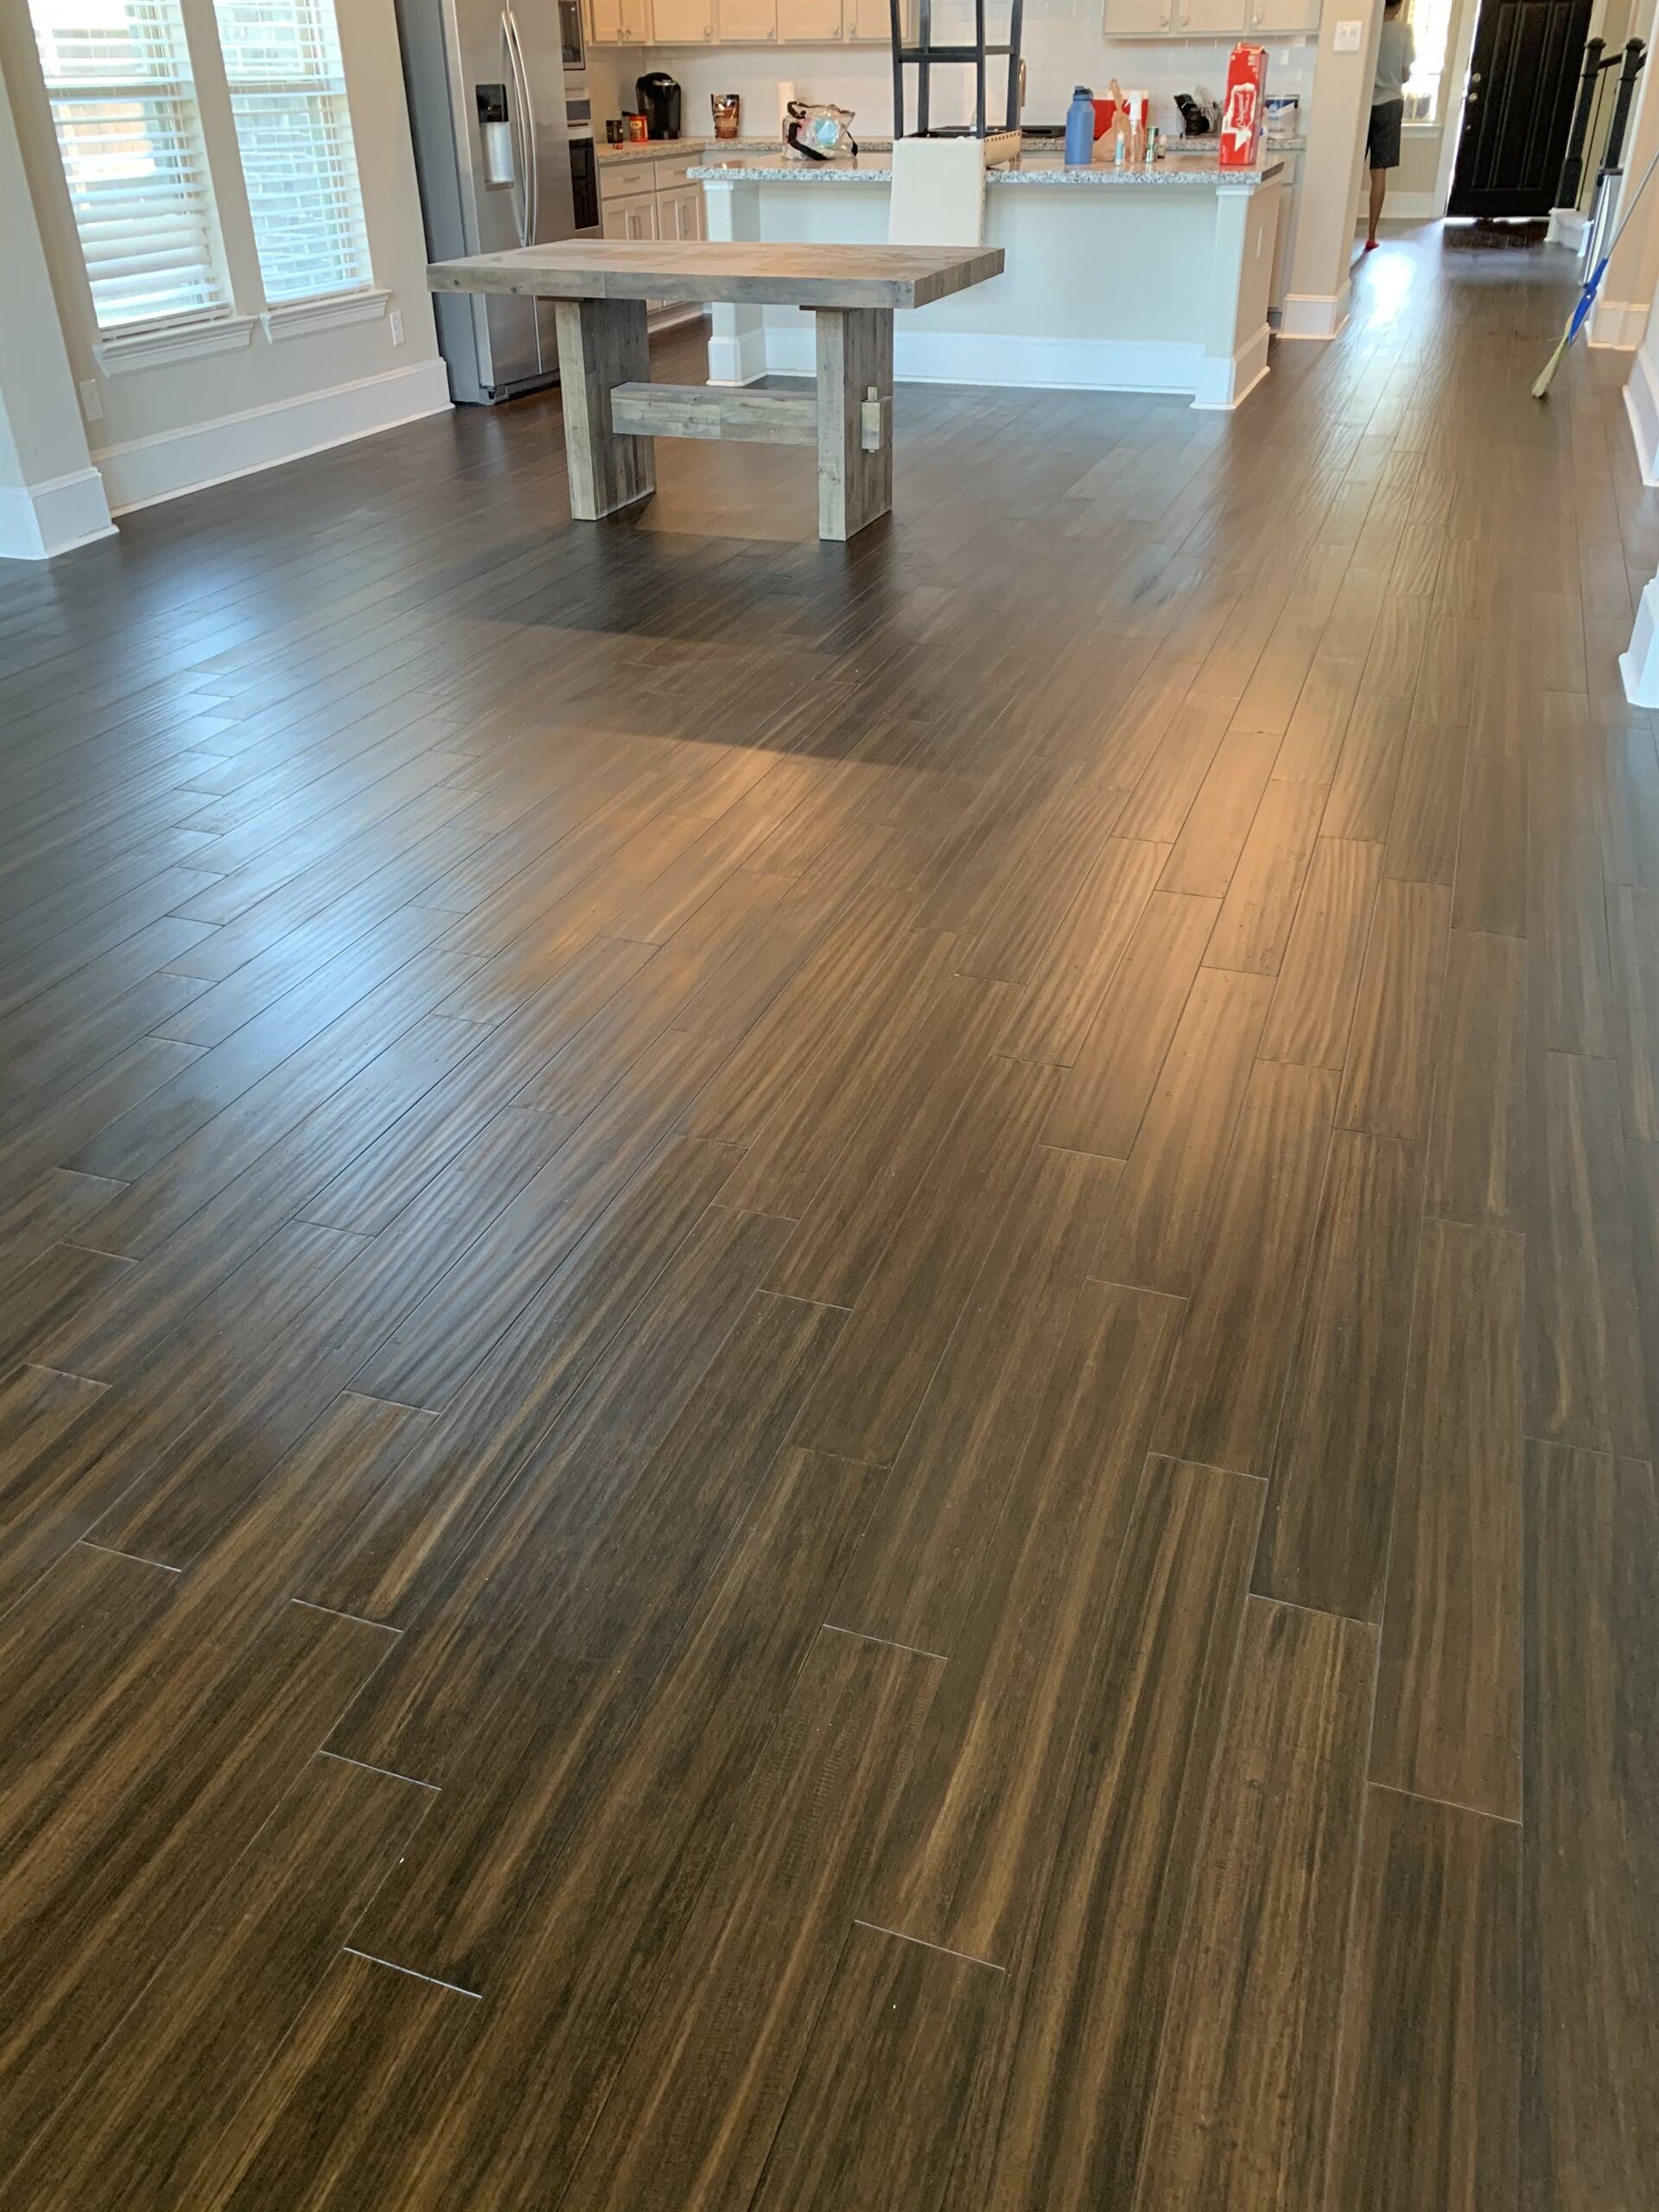 Bamboo flooring from Houston Floor Installation Services in Houston, TX